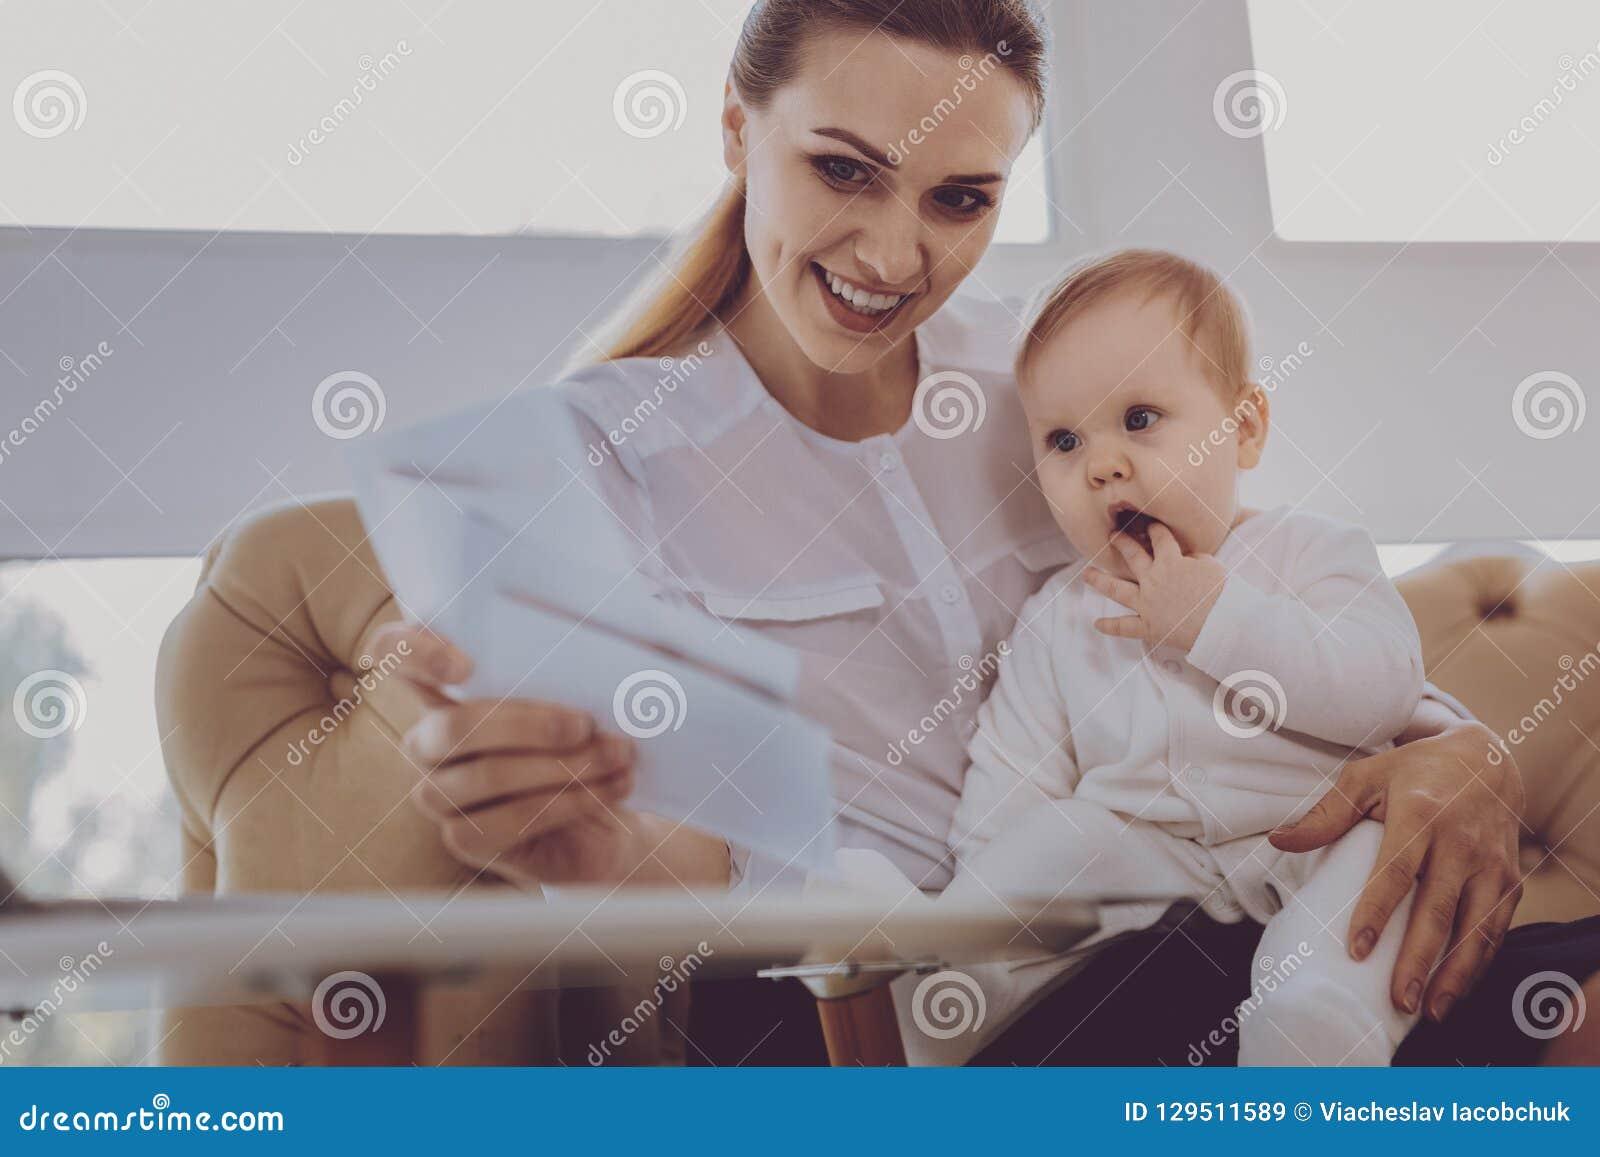 wonderful baby stock images 4194 photos